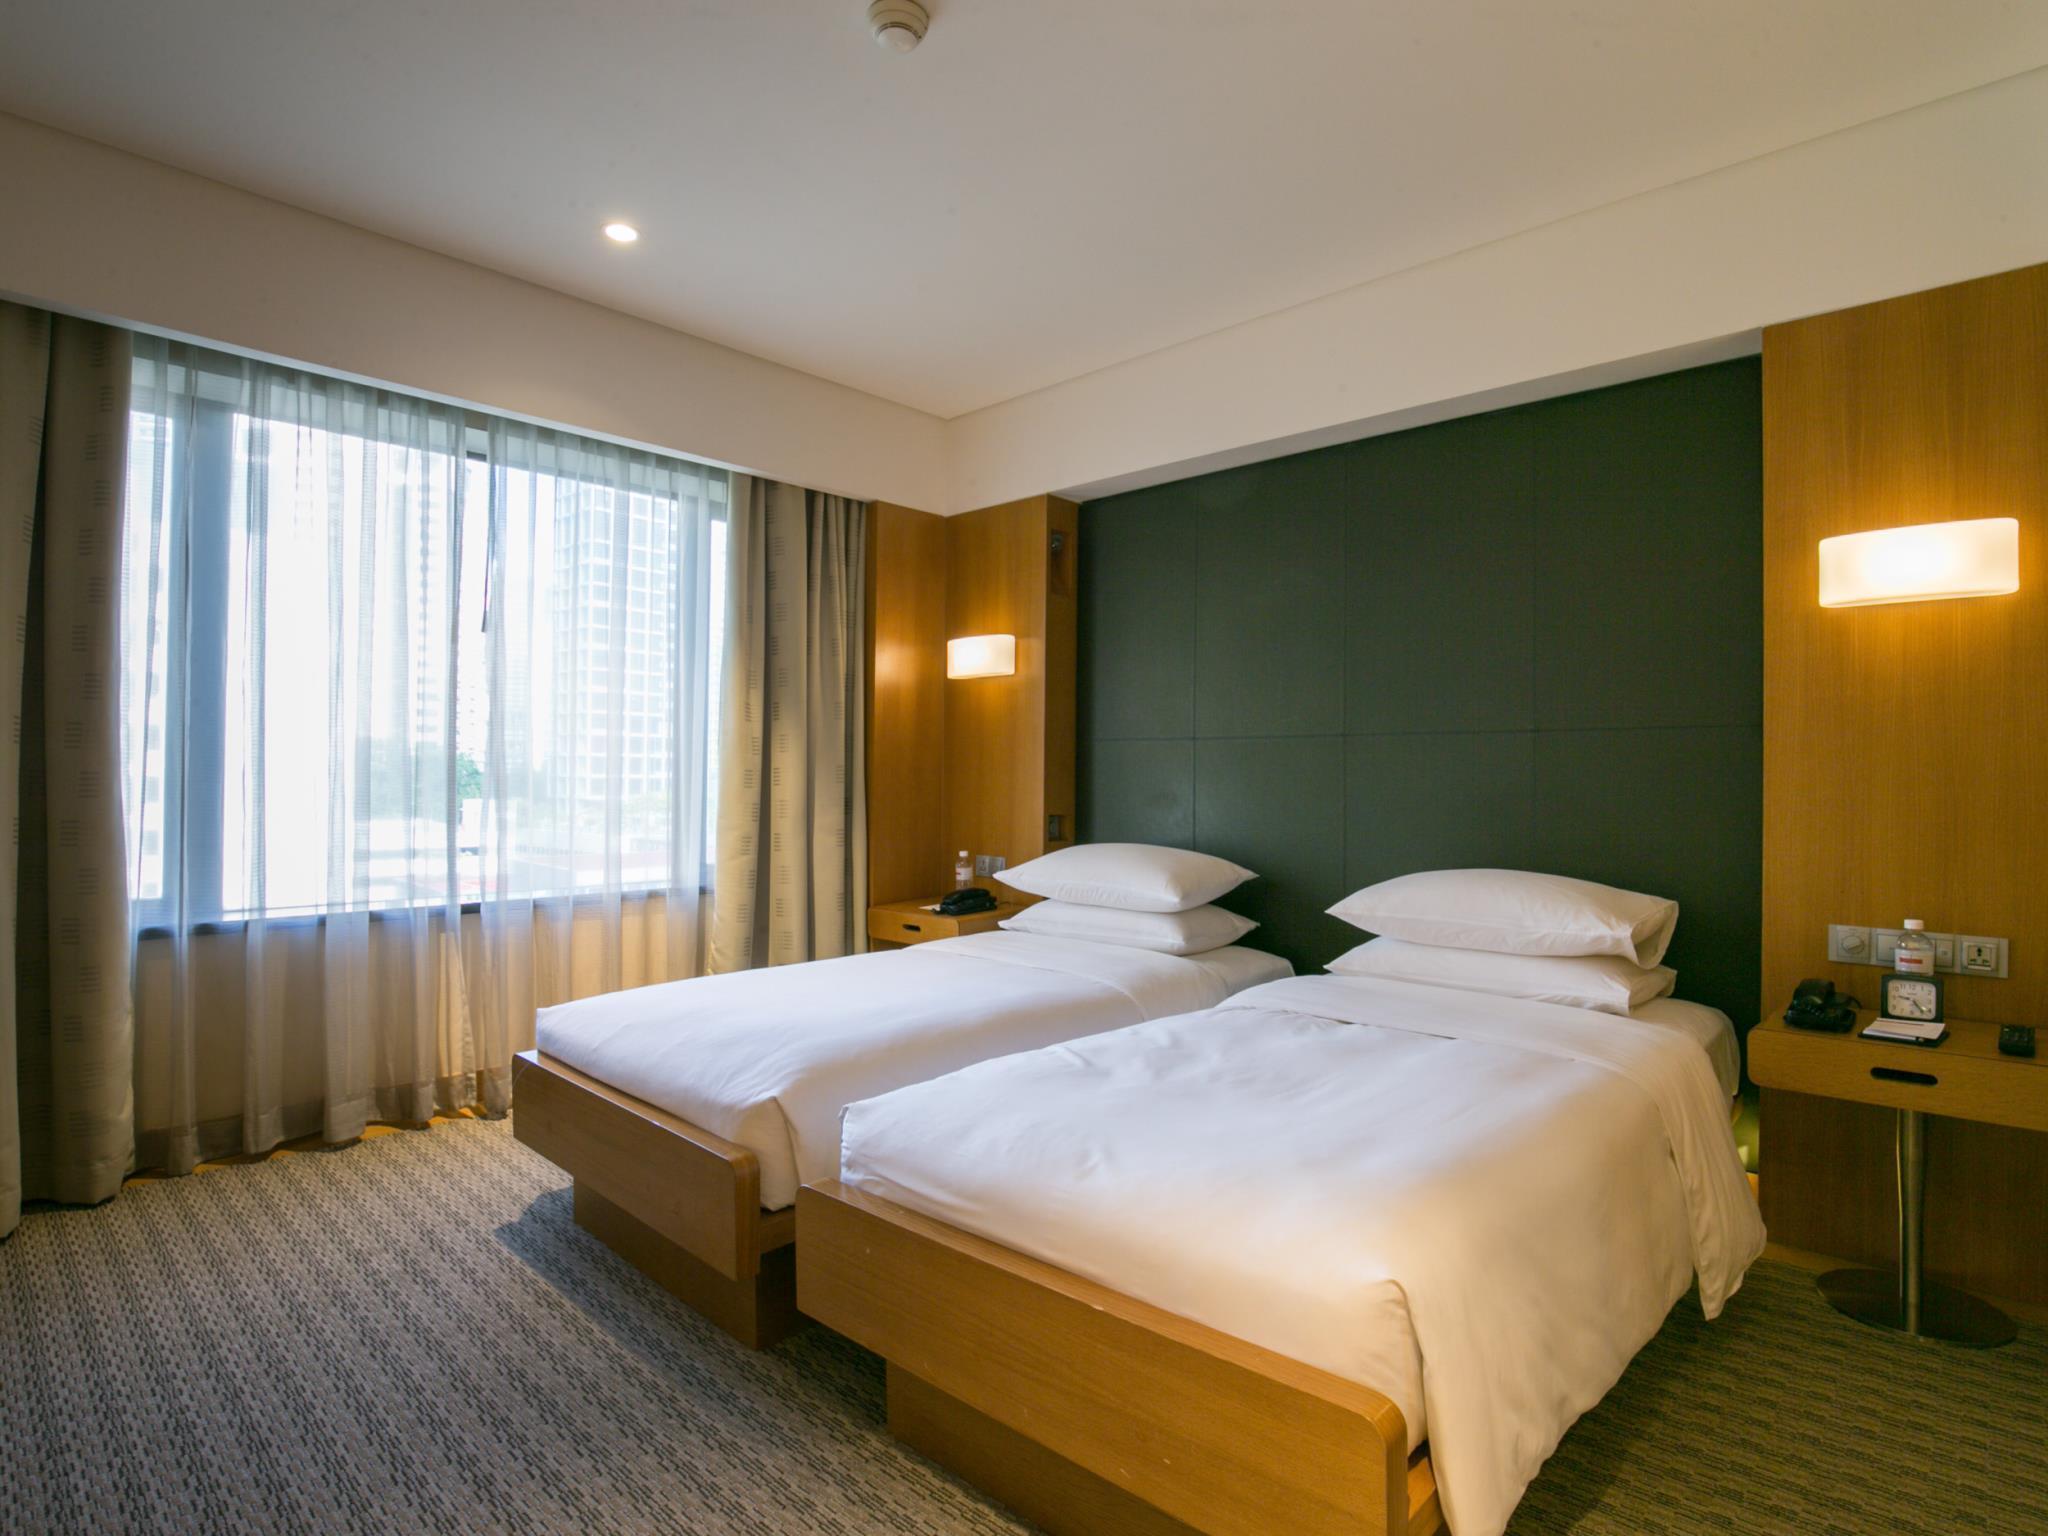 Grand hyatt singapore room deals reviews photos - 2 bedroom hotel suites singapore ...